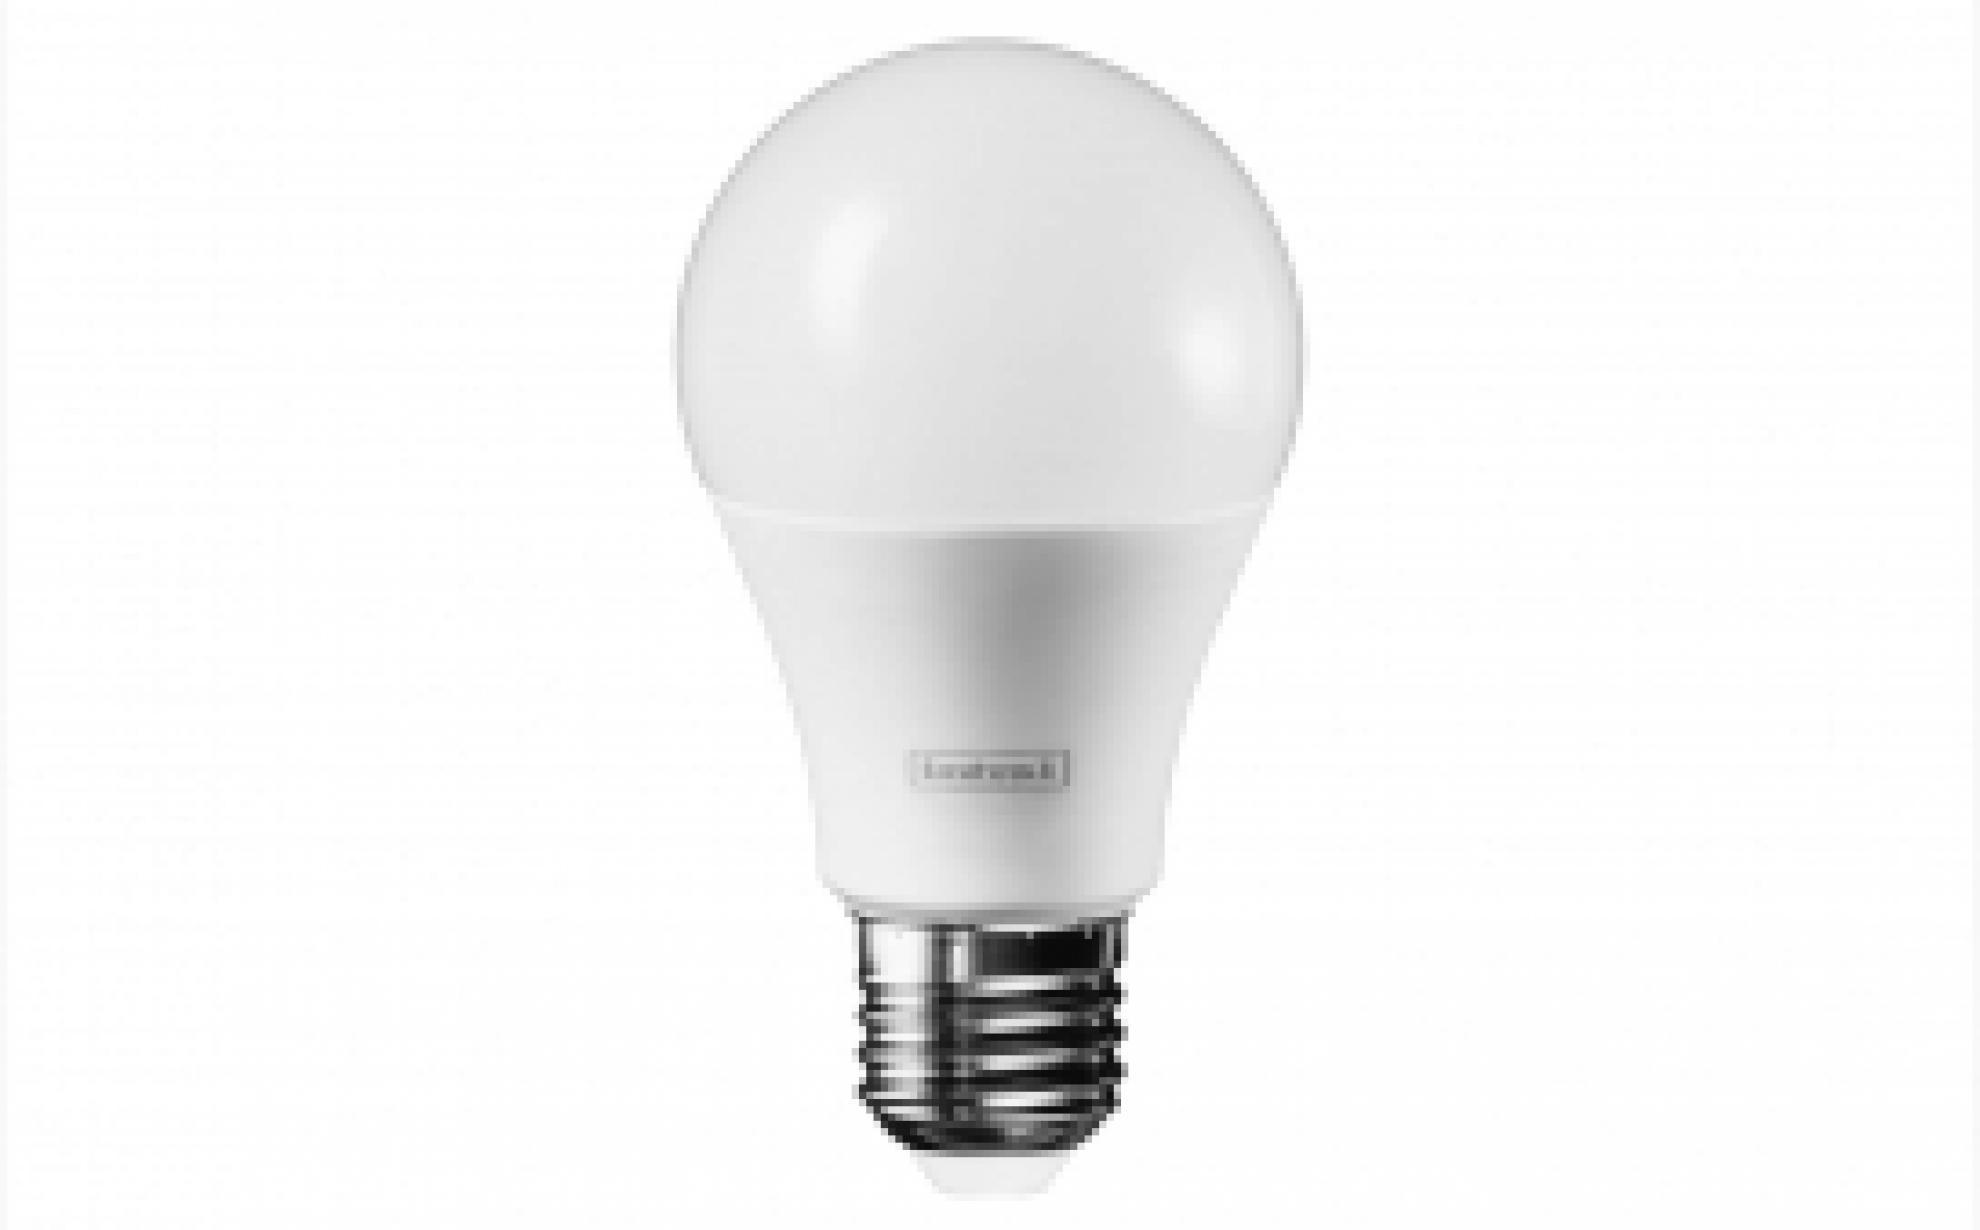 LAMPADA LED BULBO 15W 3000K BIV 60a biv